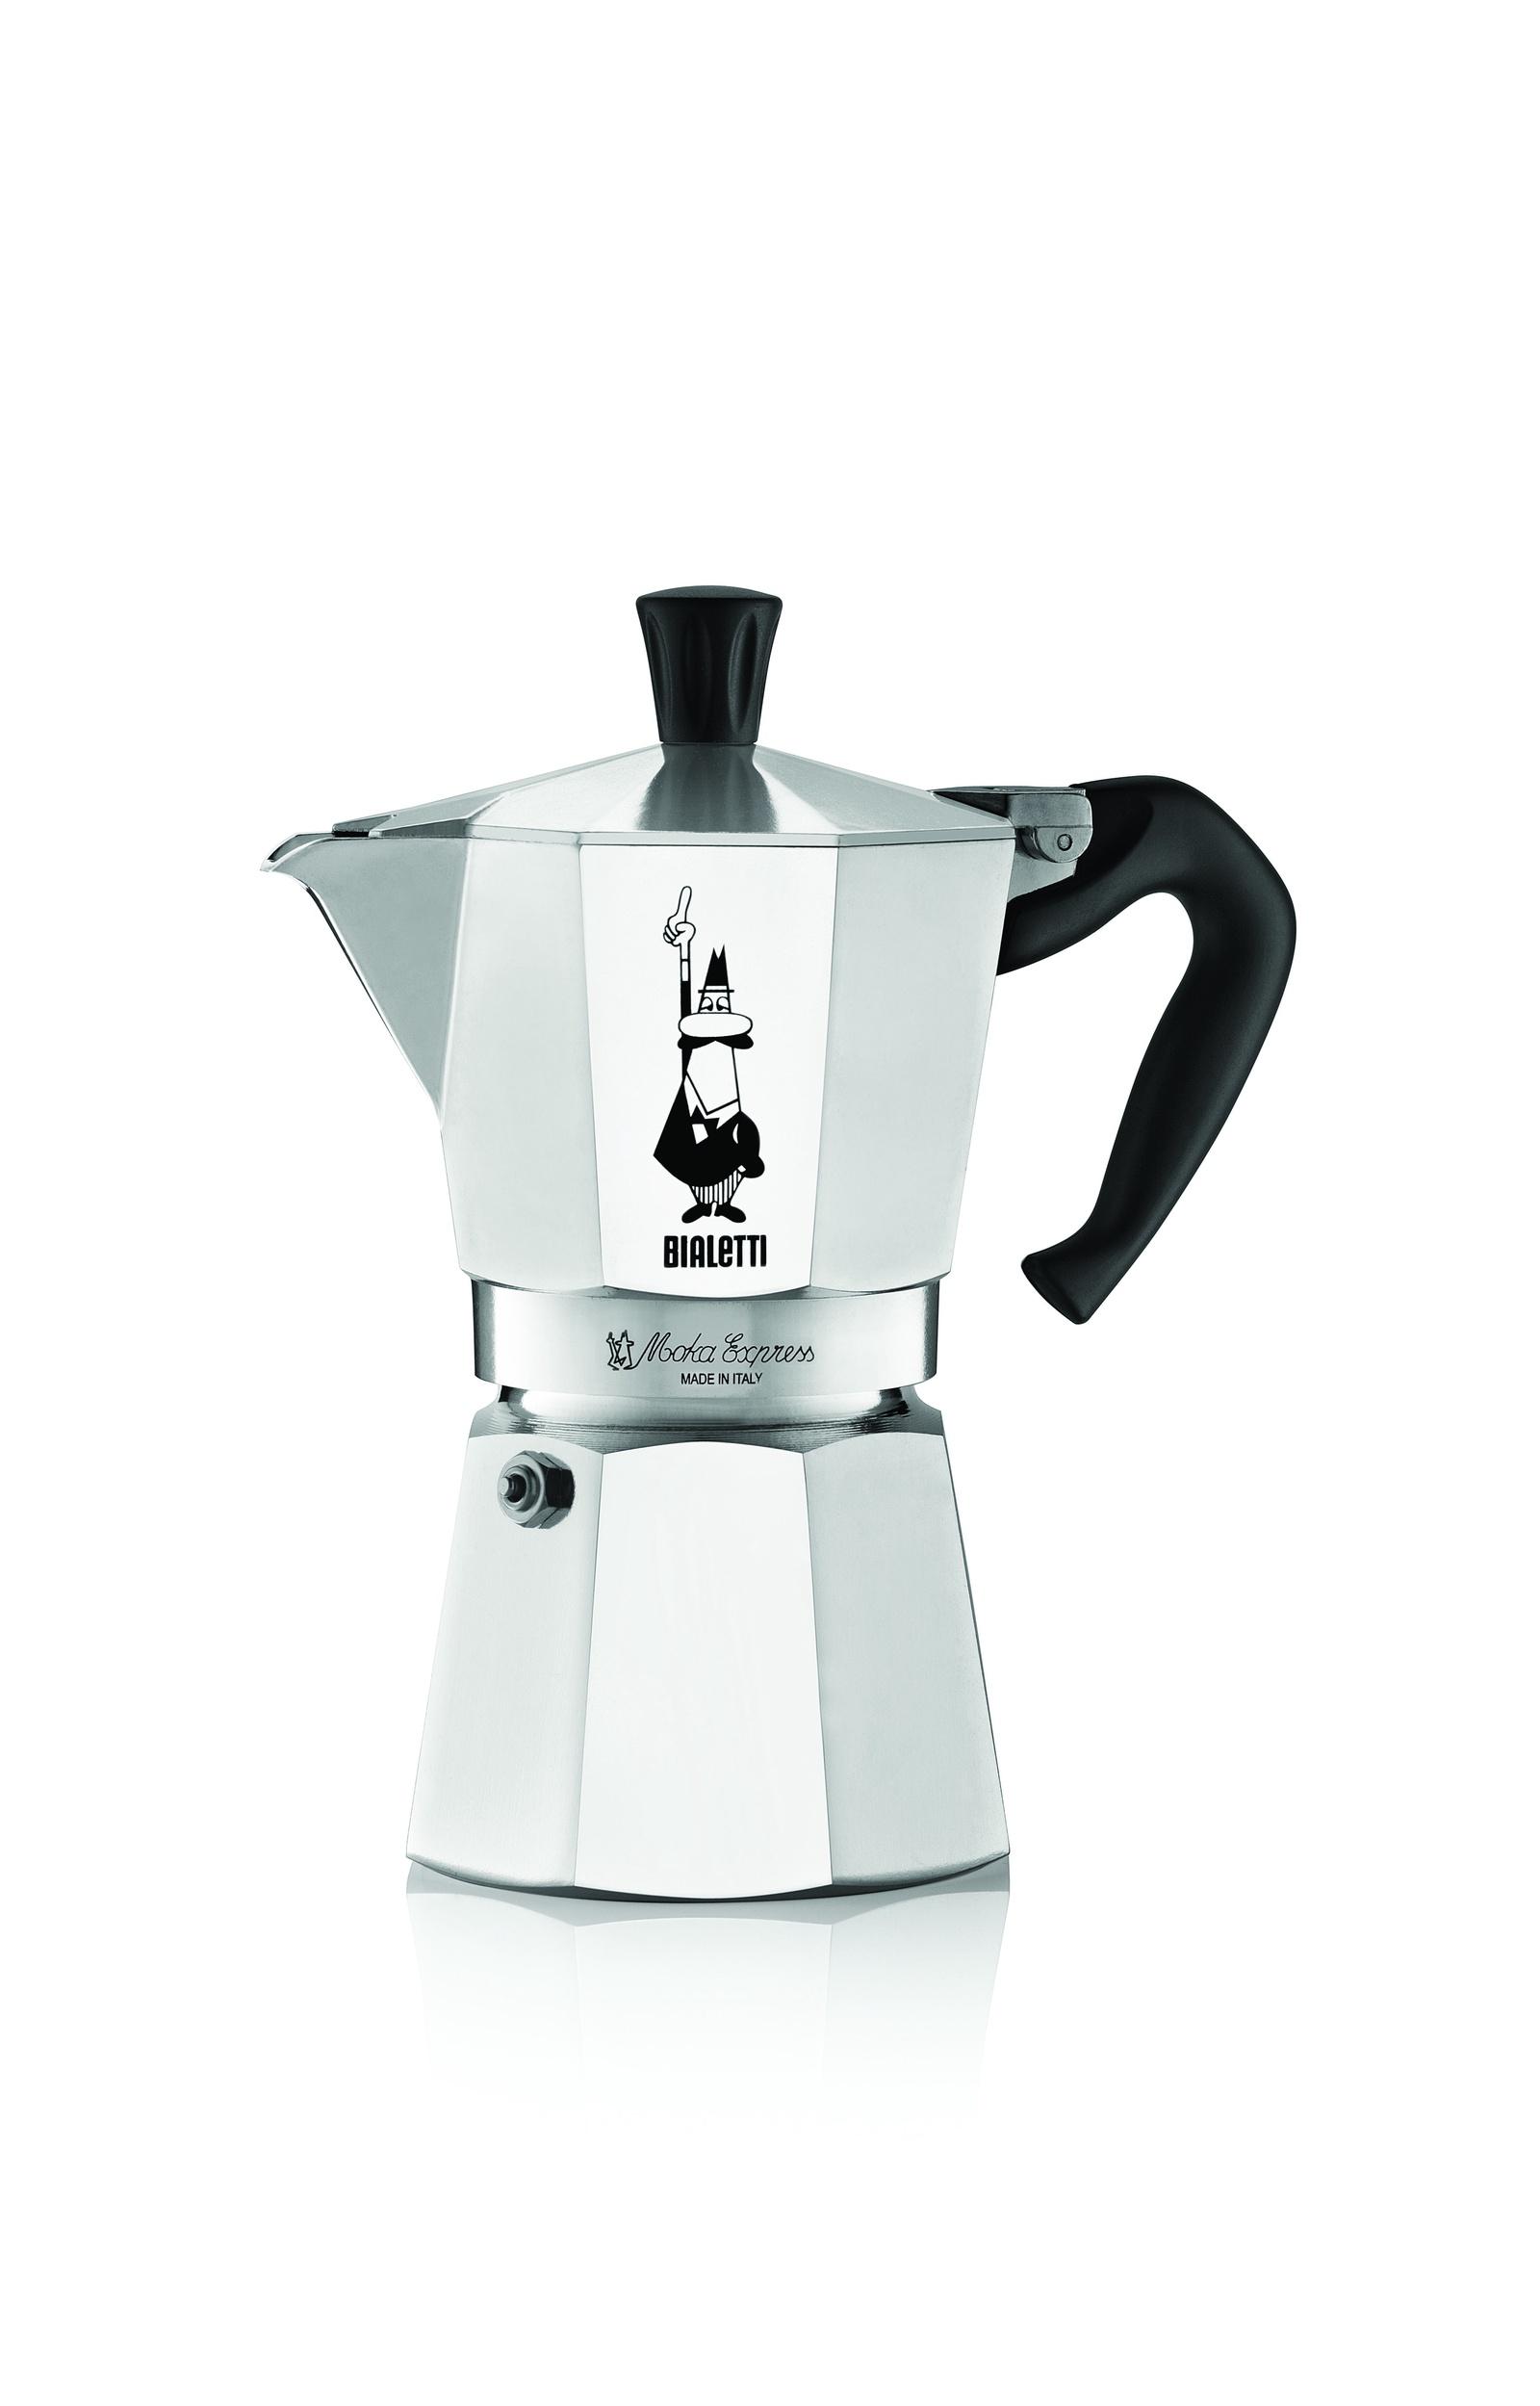 Гейзерная кофеварка Bialetti Moka Express, на 4 порции, 200 мл, Алюминий, Бакелит кофеварка гейзерная bialetti moka induzione 3 порции сталь 4922